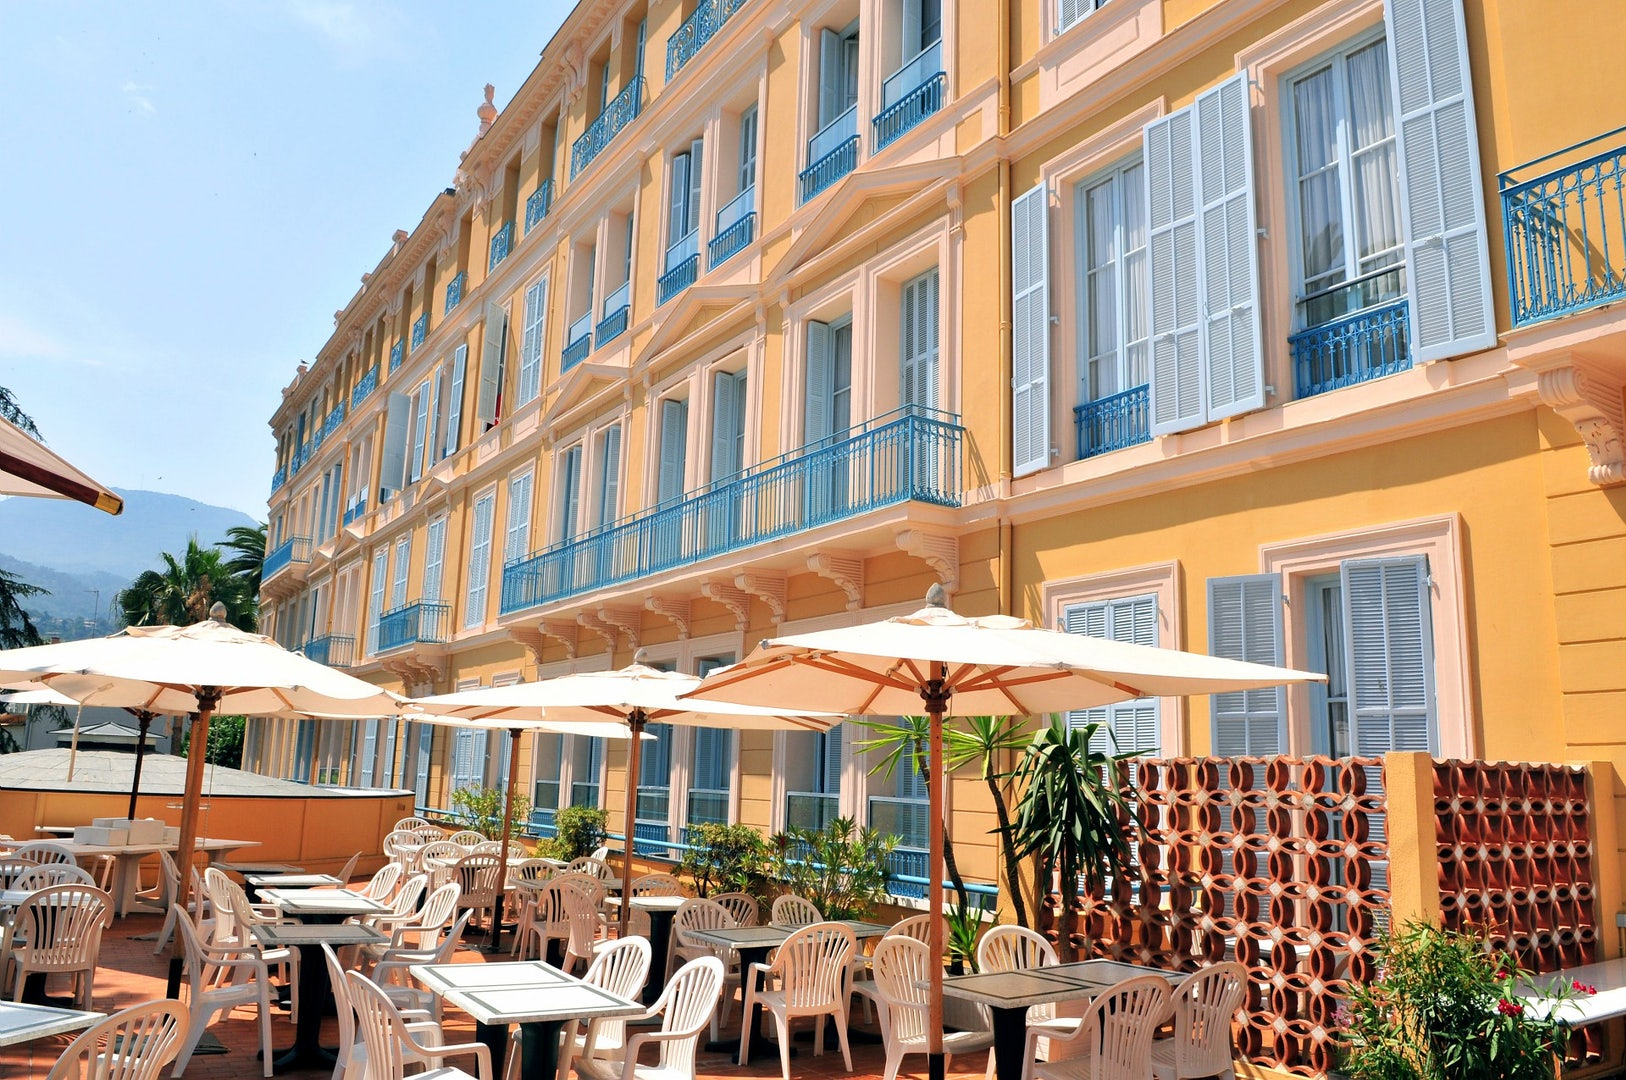 sunny terrace at hotel L'Orangeraie